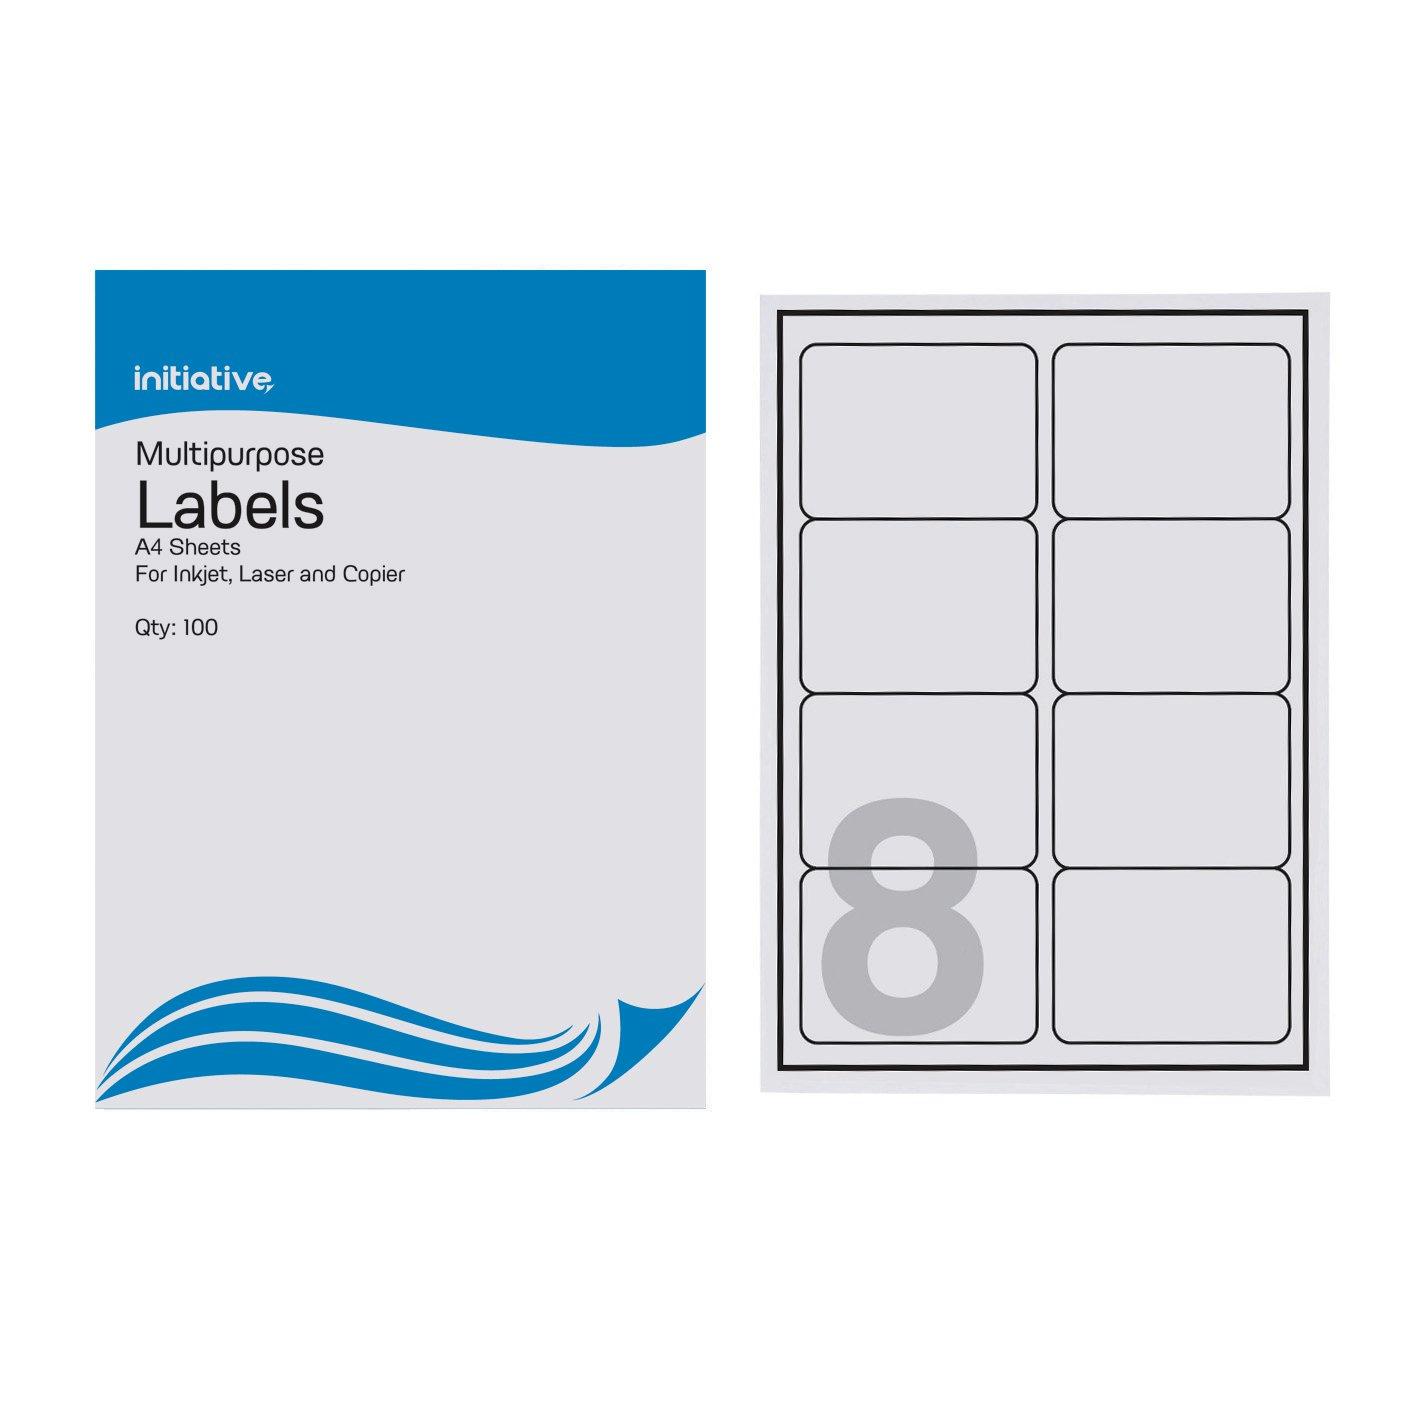 Initiative multipurpose labels 99 1 x 8 labels per for 99 1 x 67 7 mm label template